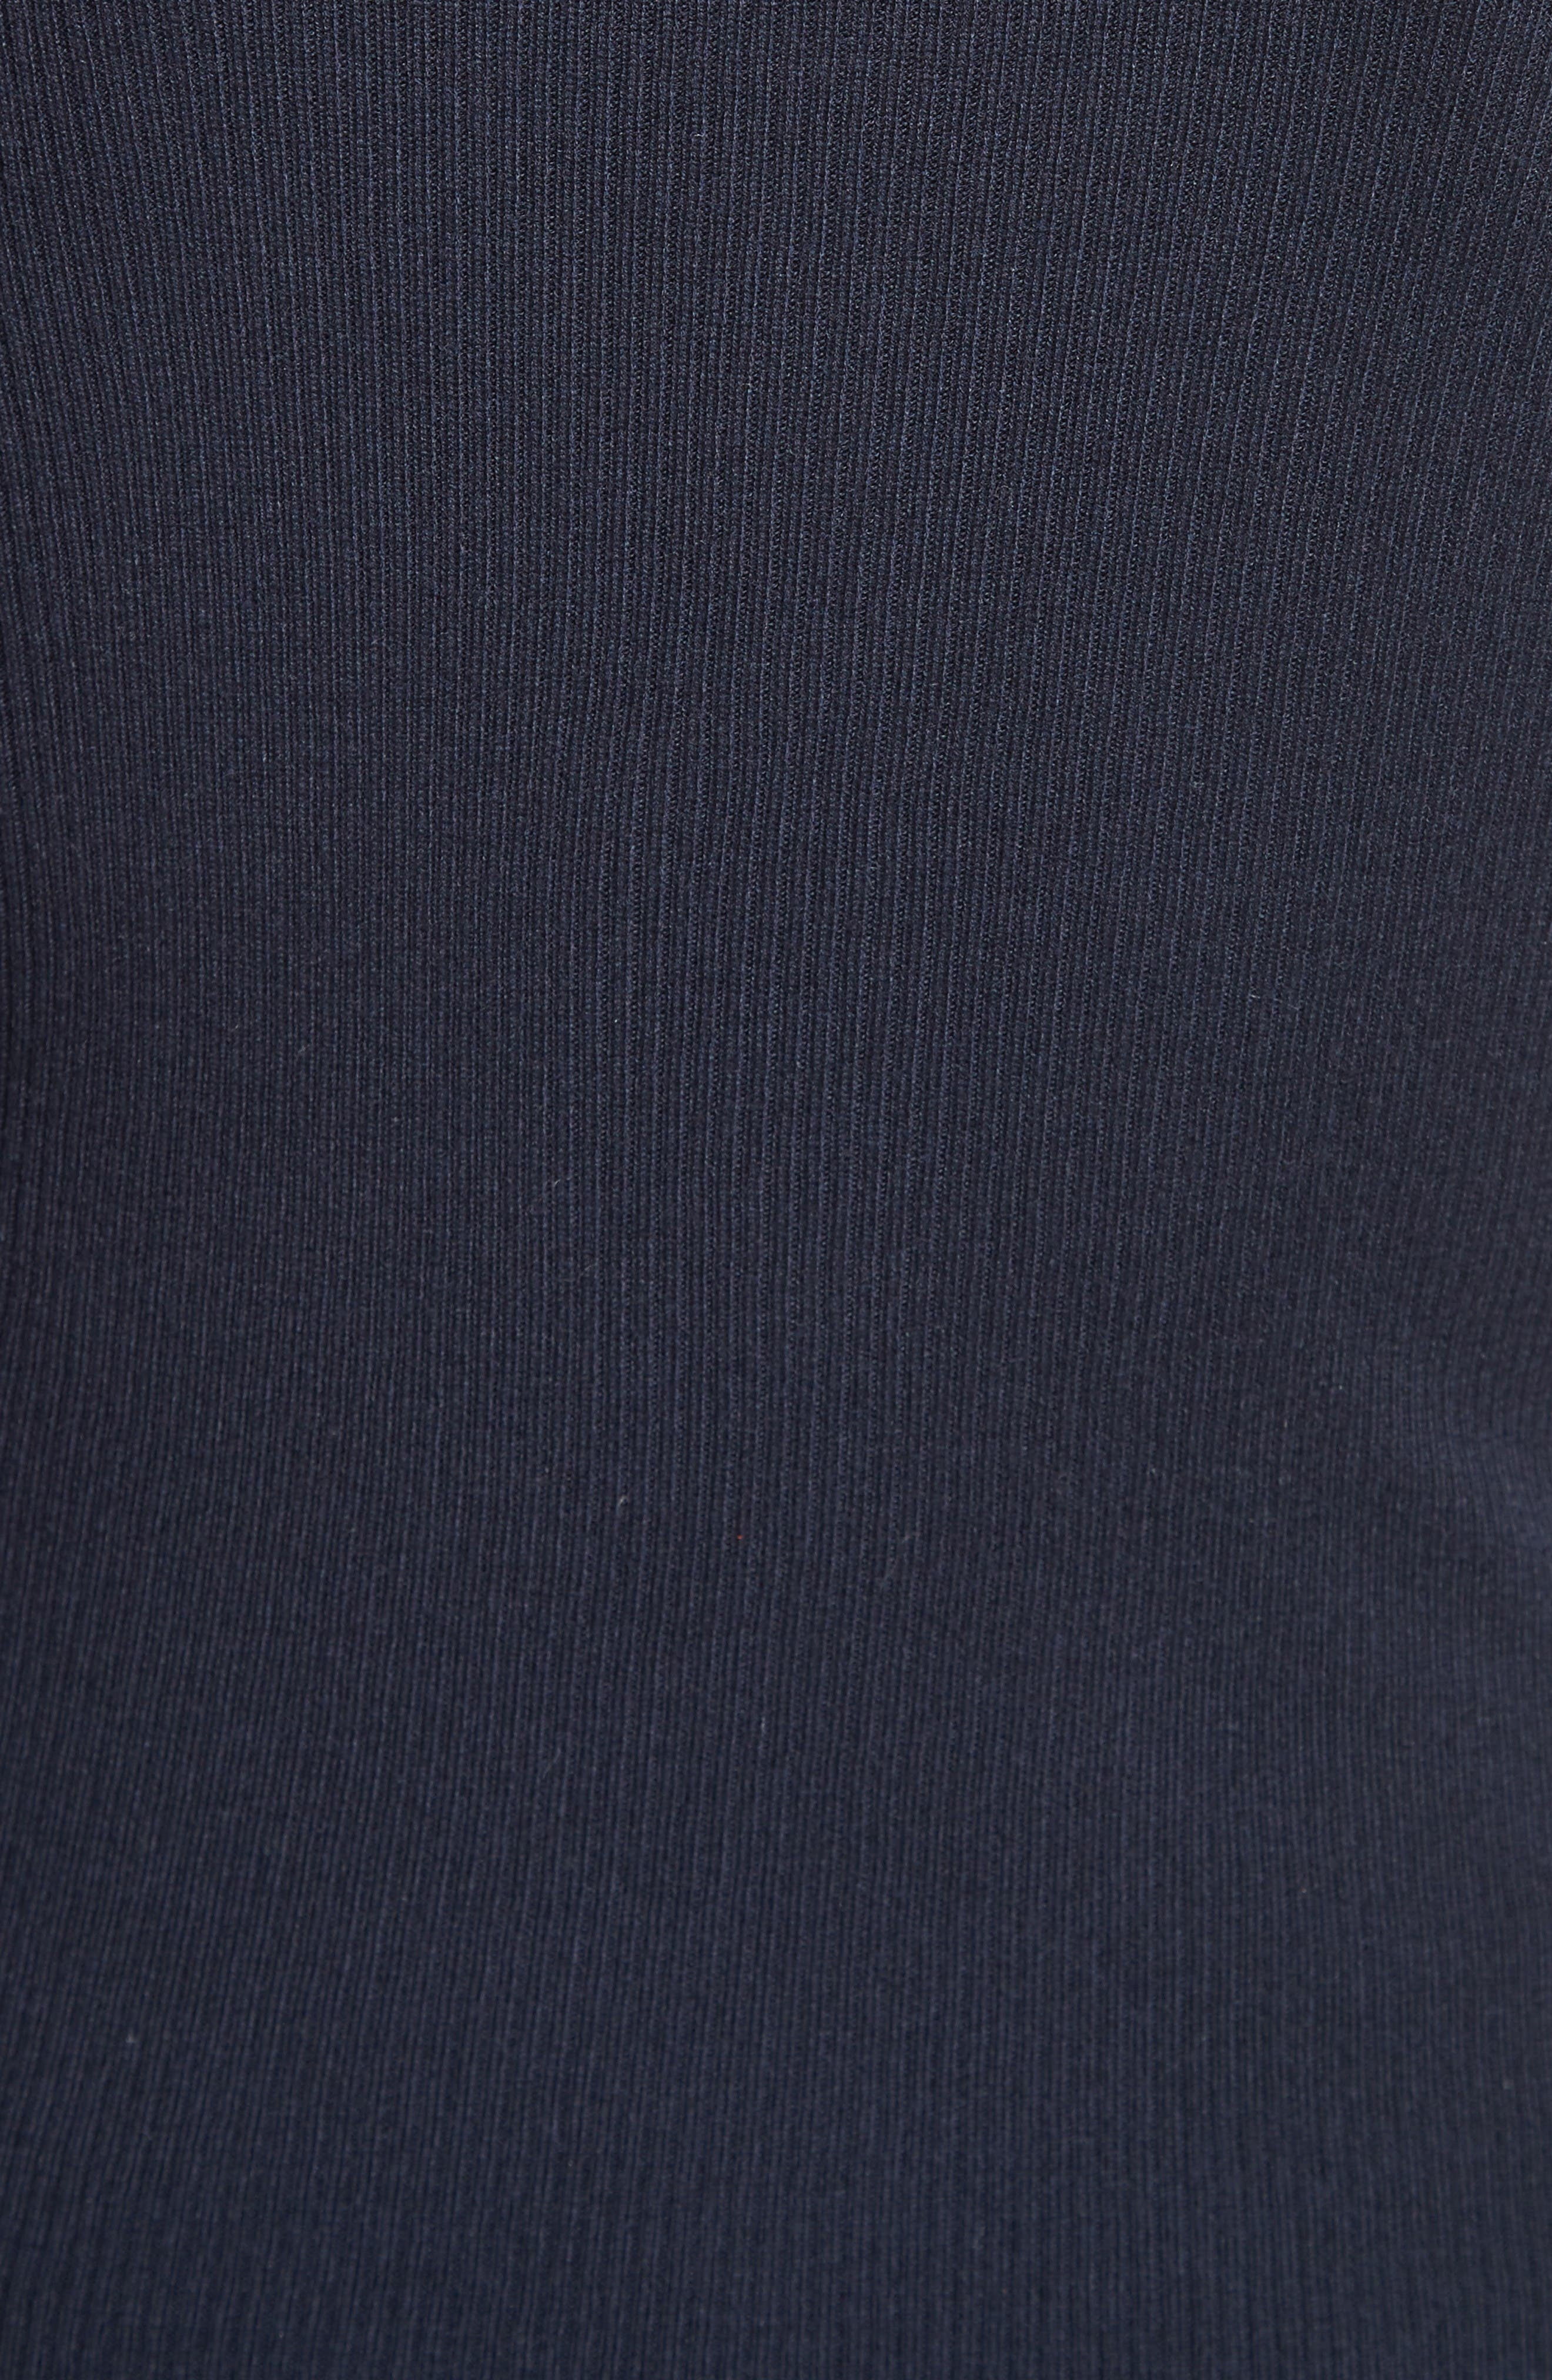 Alternate Image 5  - Ted Baker London Nehru Rib Knit Jumper